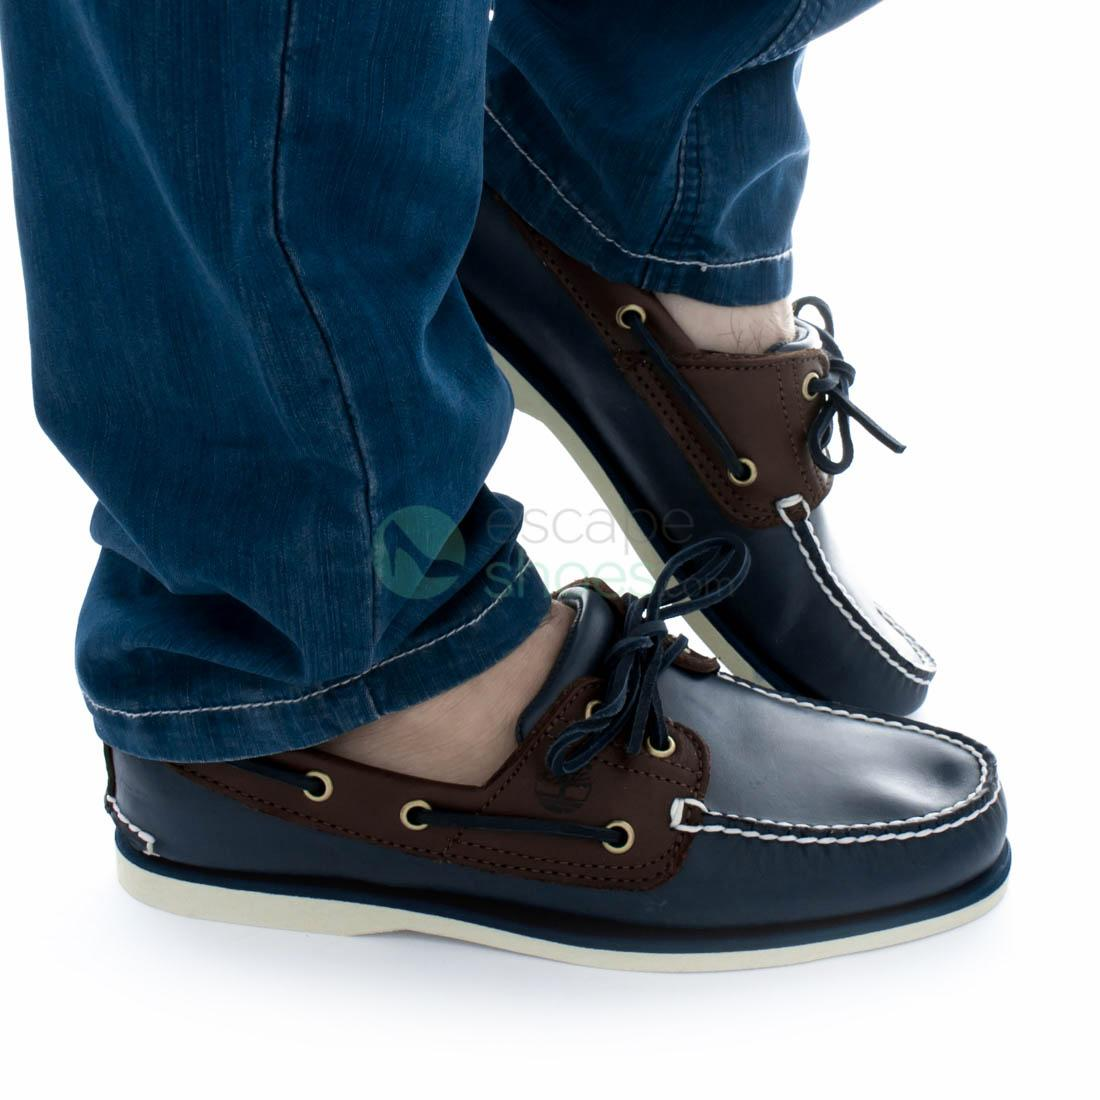 gritar Ganar control Colibrí  Boat Shoes TIMBERLAND Classic 2 Eye Blue Dark Brown A16MJ